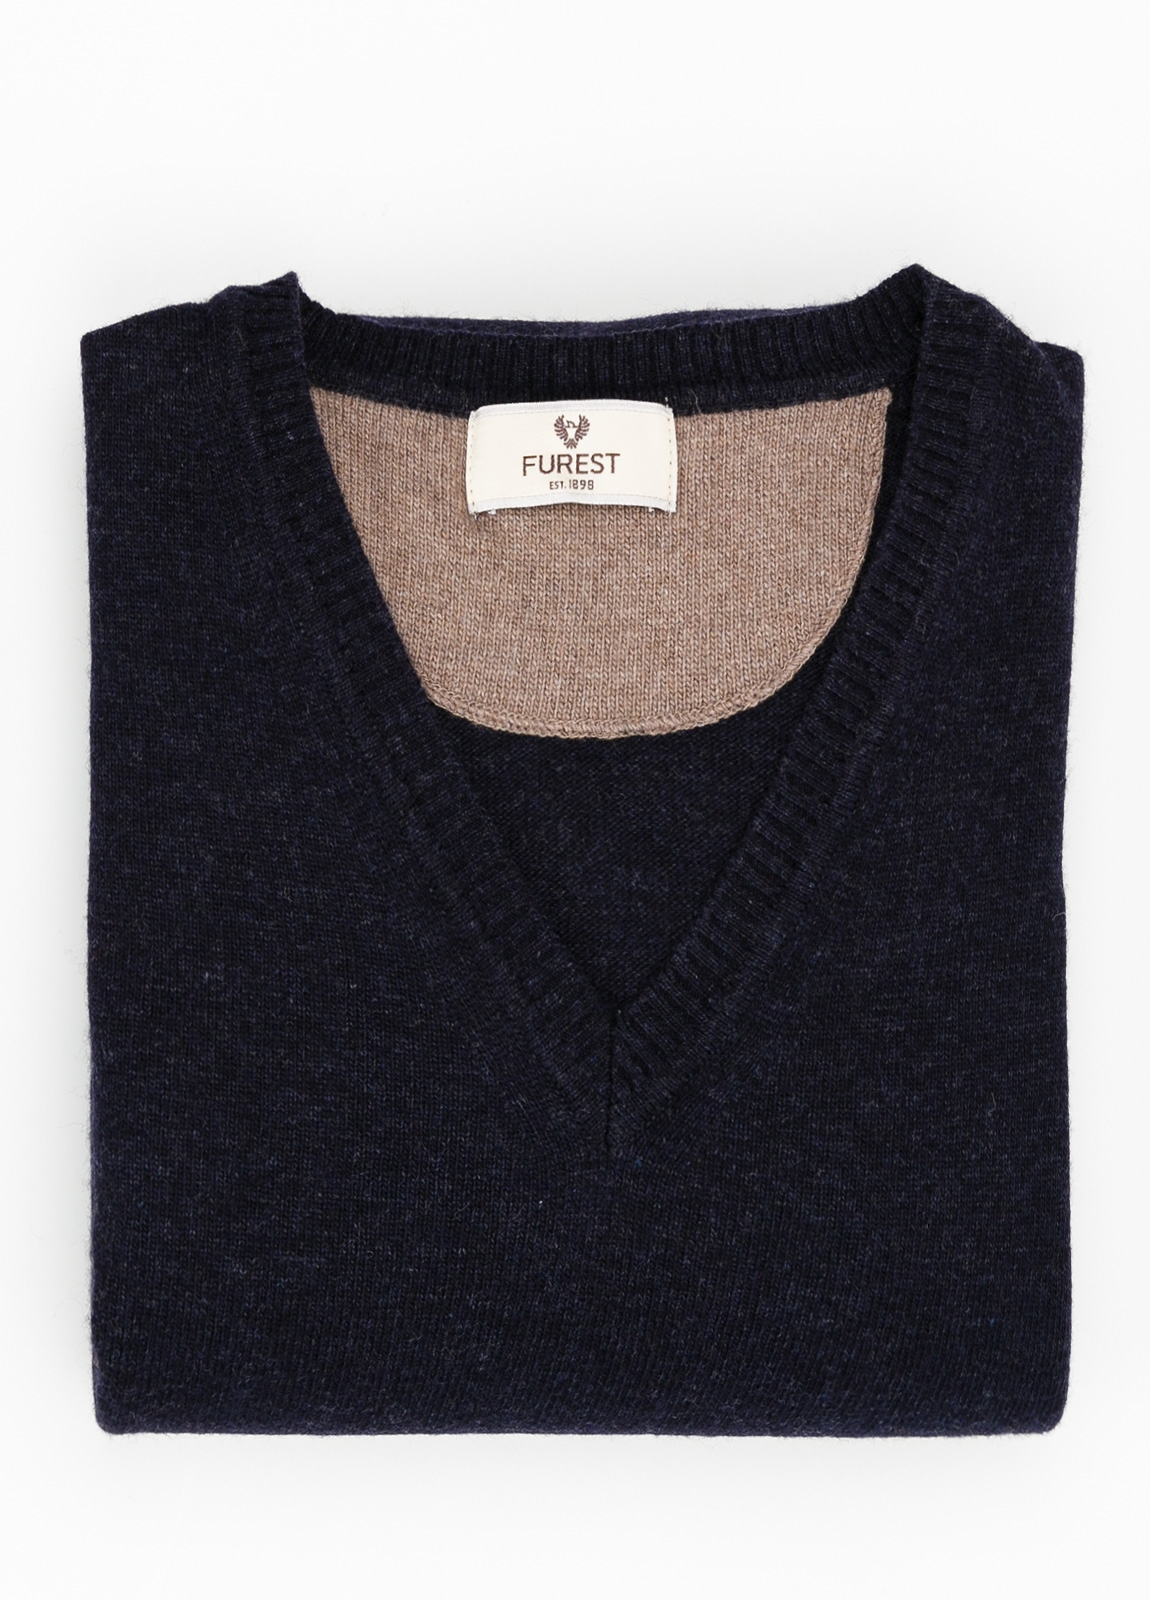 Jersey liso cuello pico color azul marino, 40% lana merino, 20% viscosa, 10% cachemire - Ítem1